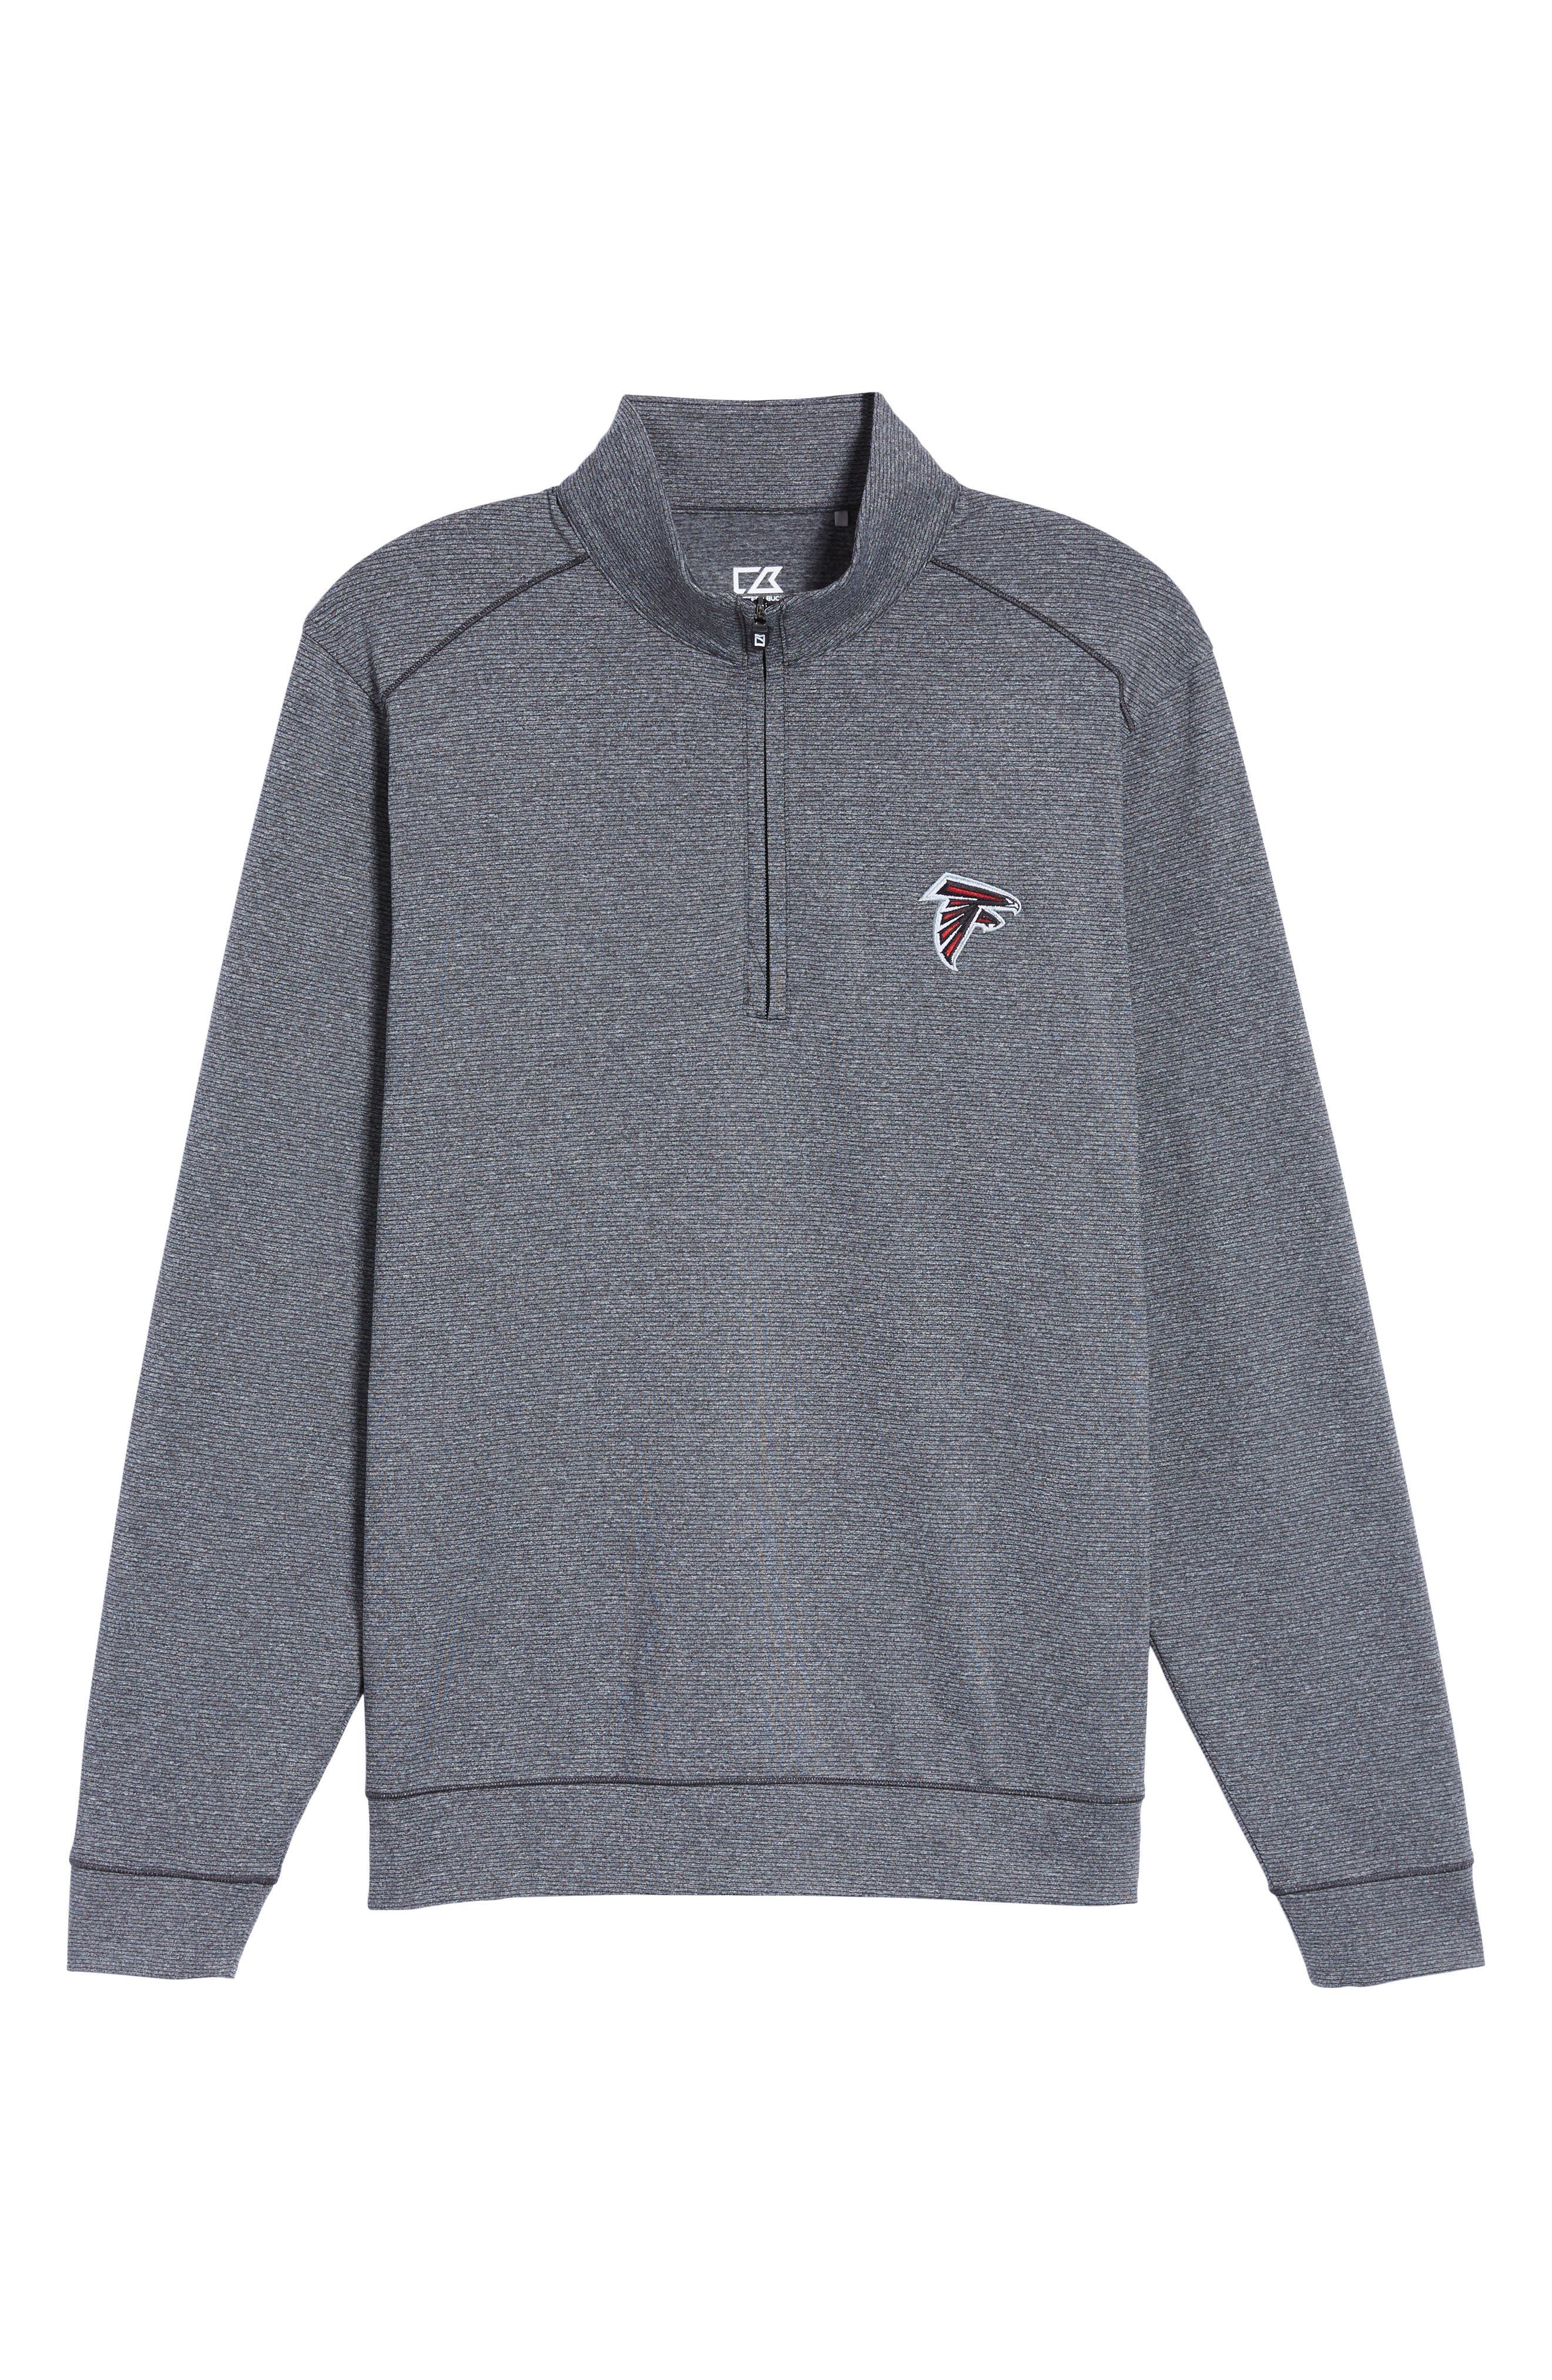 Shoreline - Atlanta Falcons Half Zip Pullover,                             Alternate thumbnail 6, color,                             Charcoal Heather